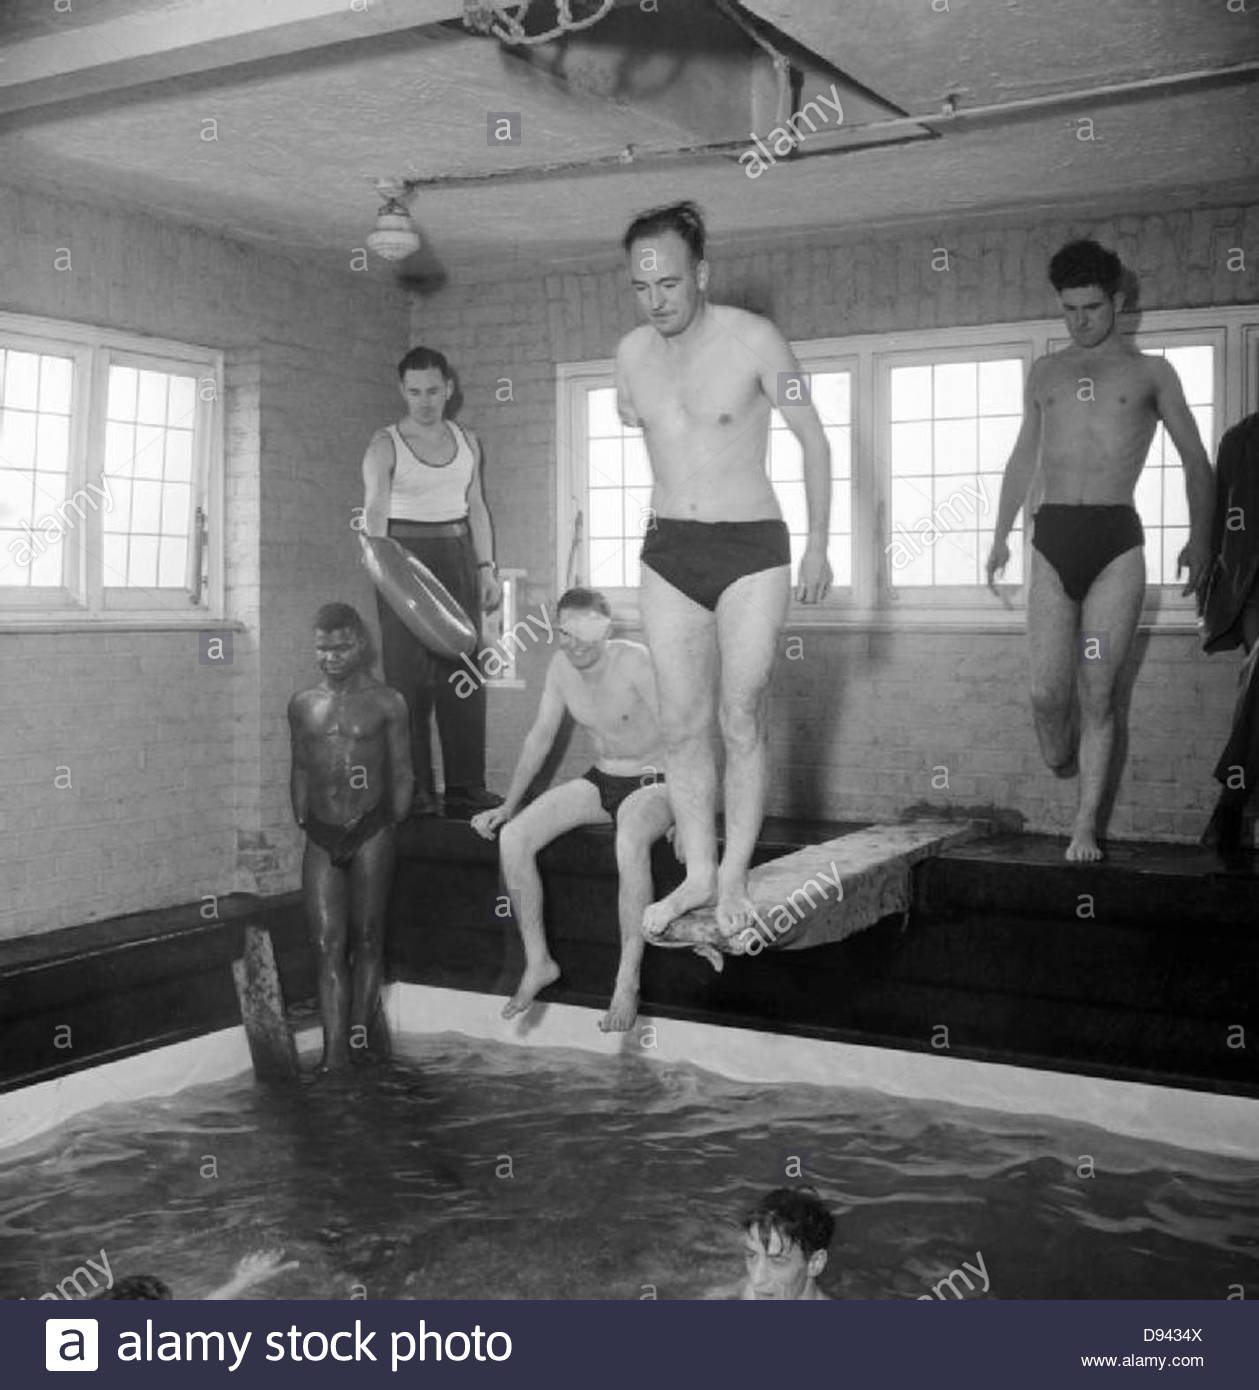 Réadaptation- le travail de l'hôpital Queen Mary, Roehampton, Londres, Angleterre, RU, 1944 D18149 Photo Stock